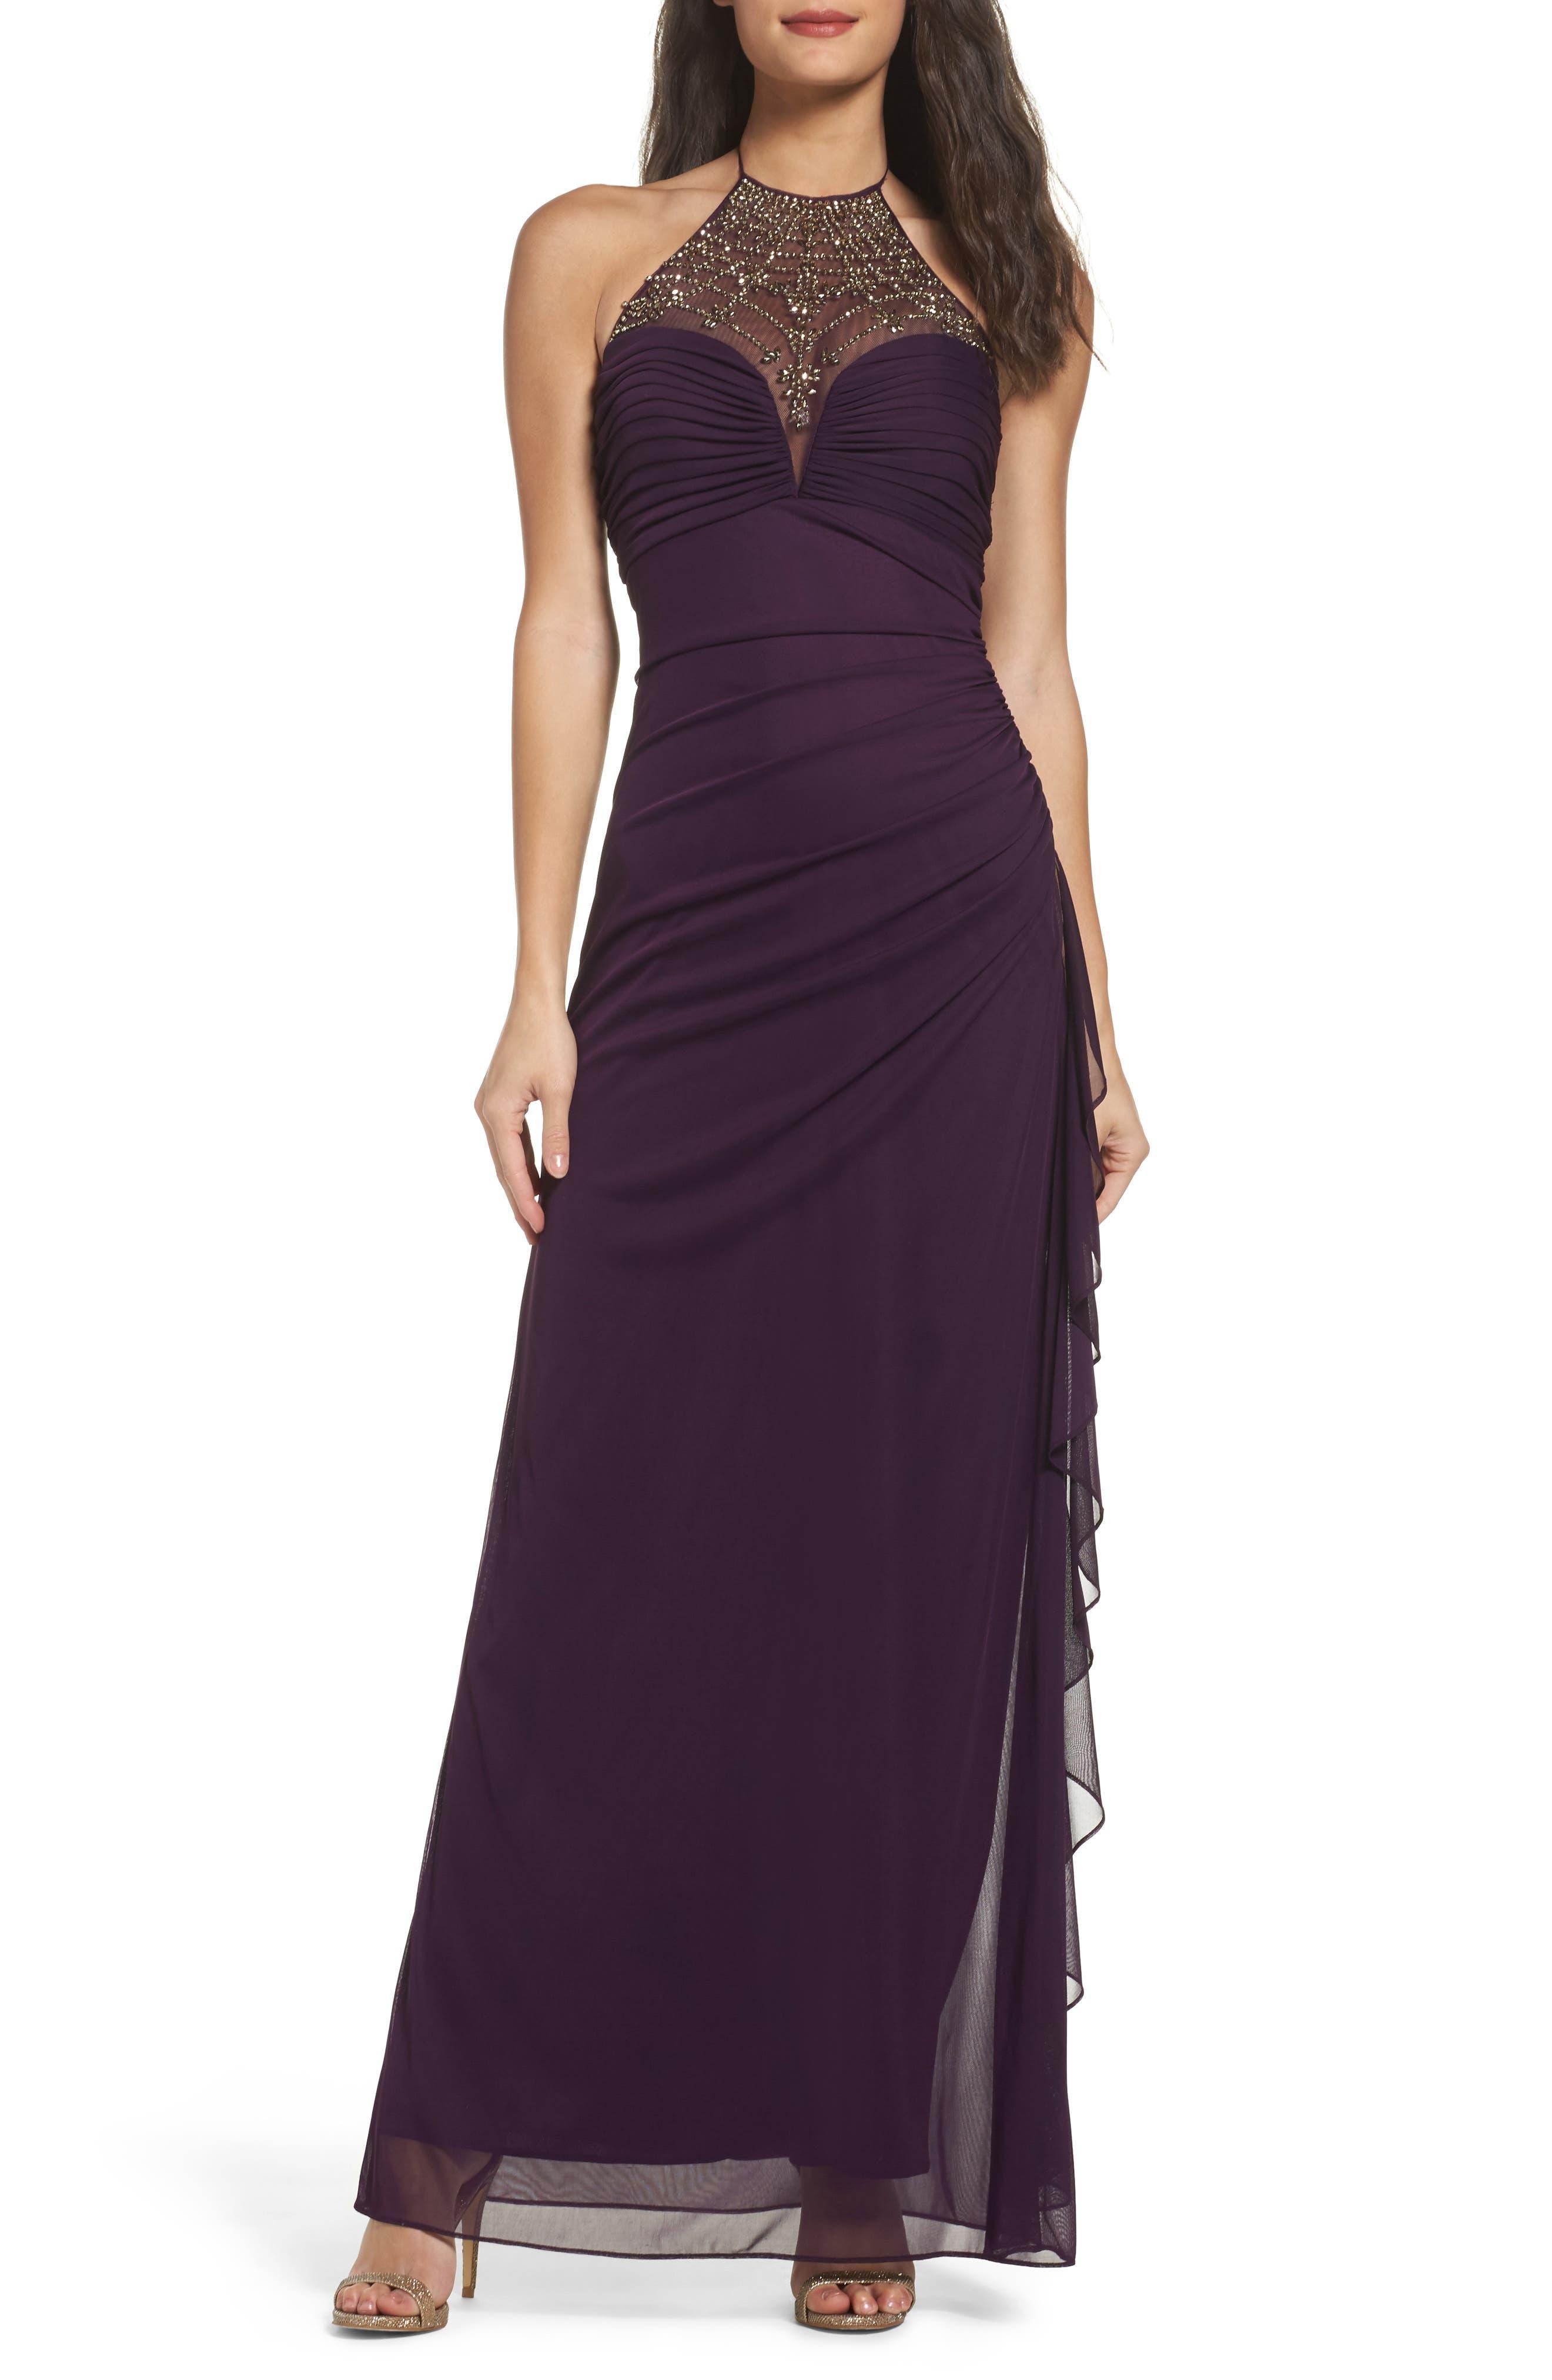 Blondie Nights Embellished Halter Gown